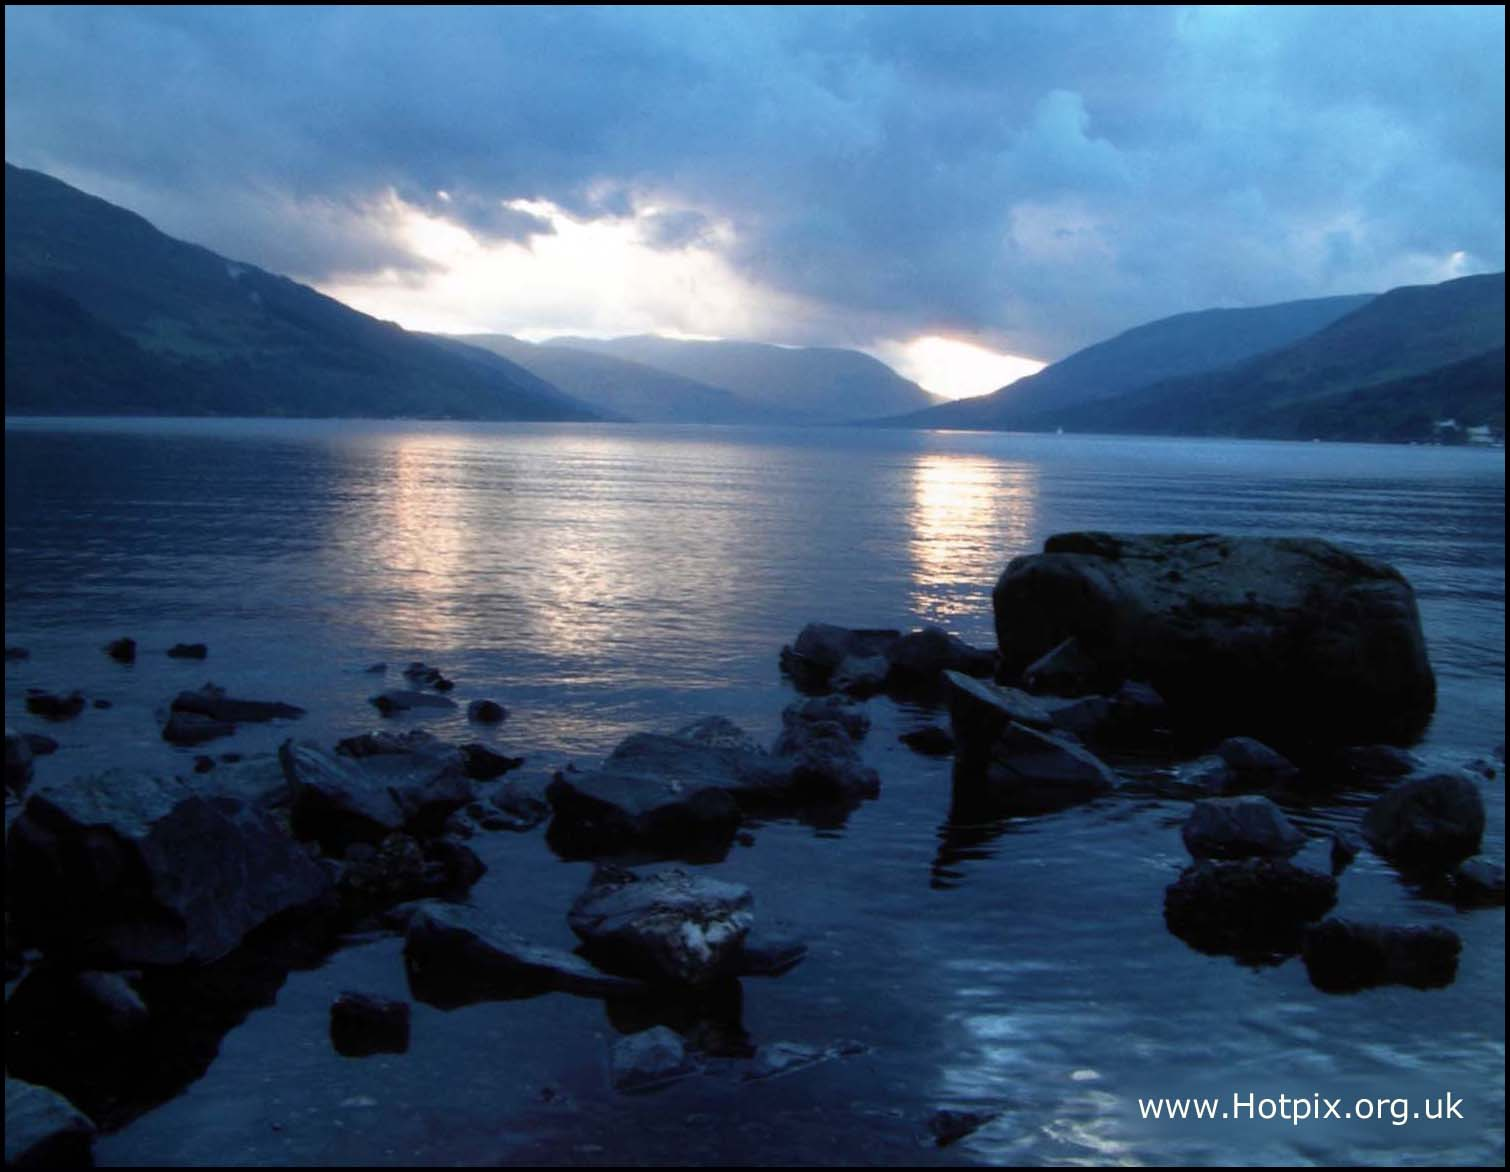 Loch,Earn,Sunset,Scotland,Perth,UK,lake,water,sky,dusk,clouds,blue,rocks,rock,reflection,reflections,Schotland,l'Ecosse,Ecosse,Schottland,\u03a3\u03ba\u03c9\u03c4\u03af\u03b1,la,Scozia,\u30b9\u30b3\u30c3\u30c8\u30e9\u30f3\u30c9,\uc2a4\ucf54\ud2c0\ub780\ub4dc,\u0428\u043e\u0442\u043b\u0430\u043d\u0434\u0438\u044f,Escocia,this photo rocks,tonysmith,tony,smith,noche,nuit,edinbrugh,hotpix!,#tonysmithhotpix